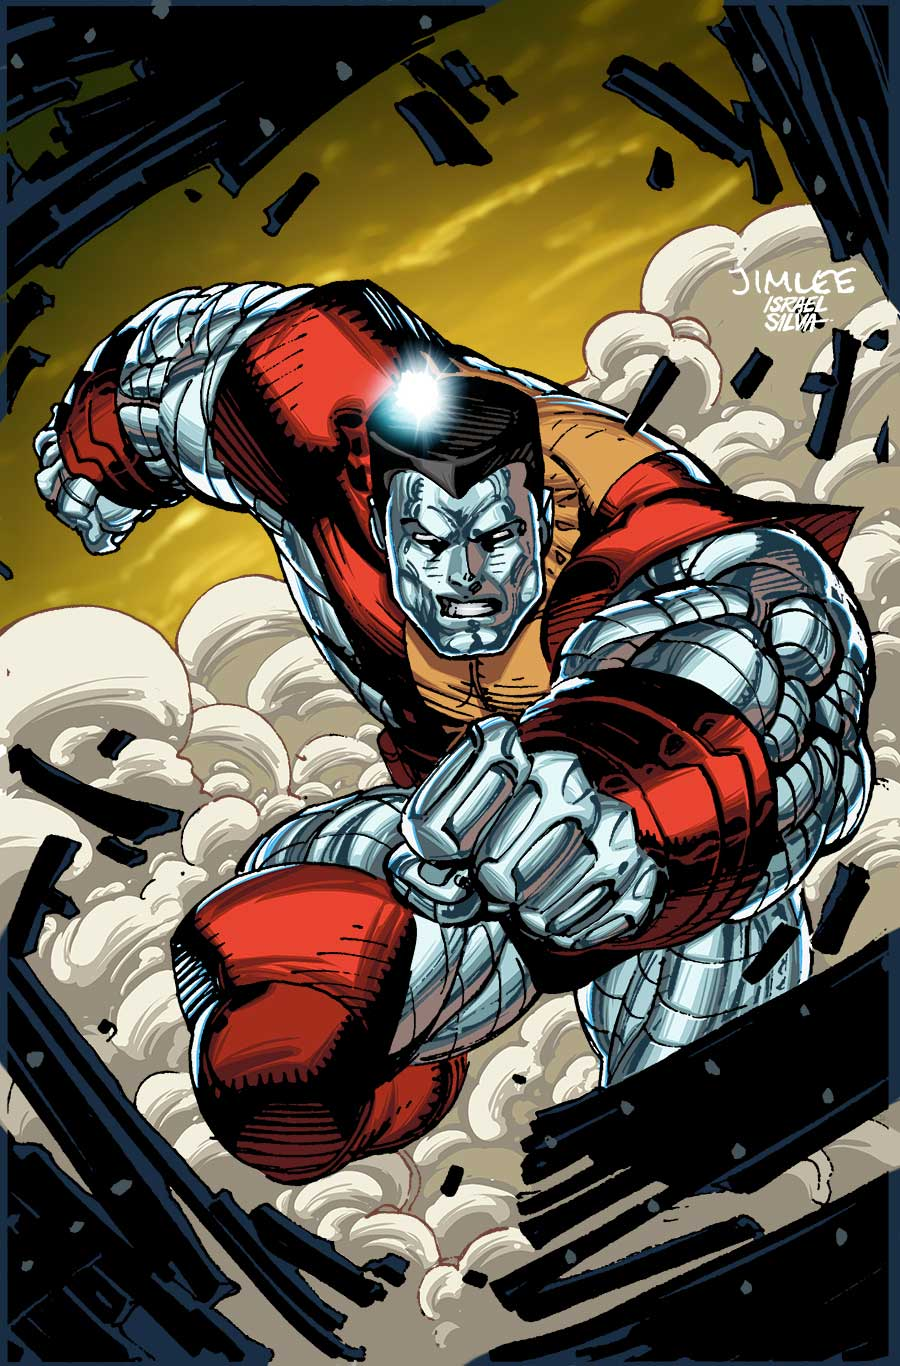 Invincible_Iron_Man_9_X-Men_Trading_Card_Variant July brings astonishing Jim Lee X-MEN TRADING CARD VARIANT COVERS